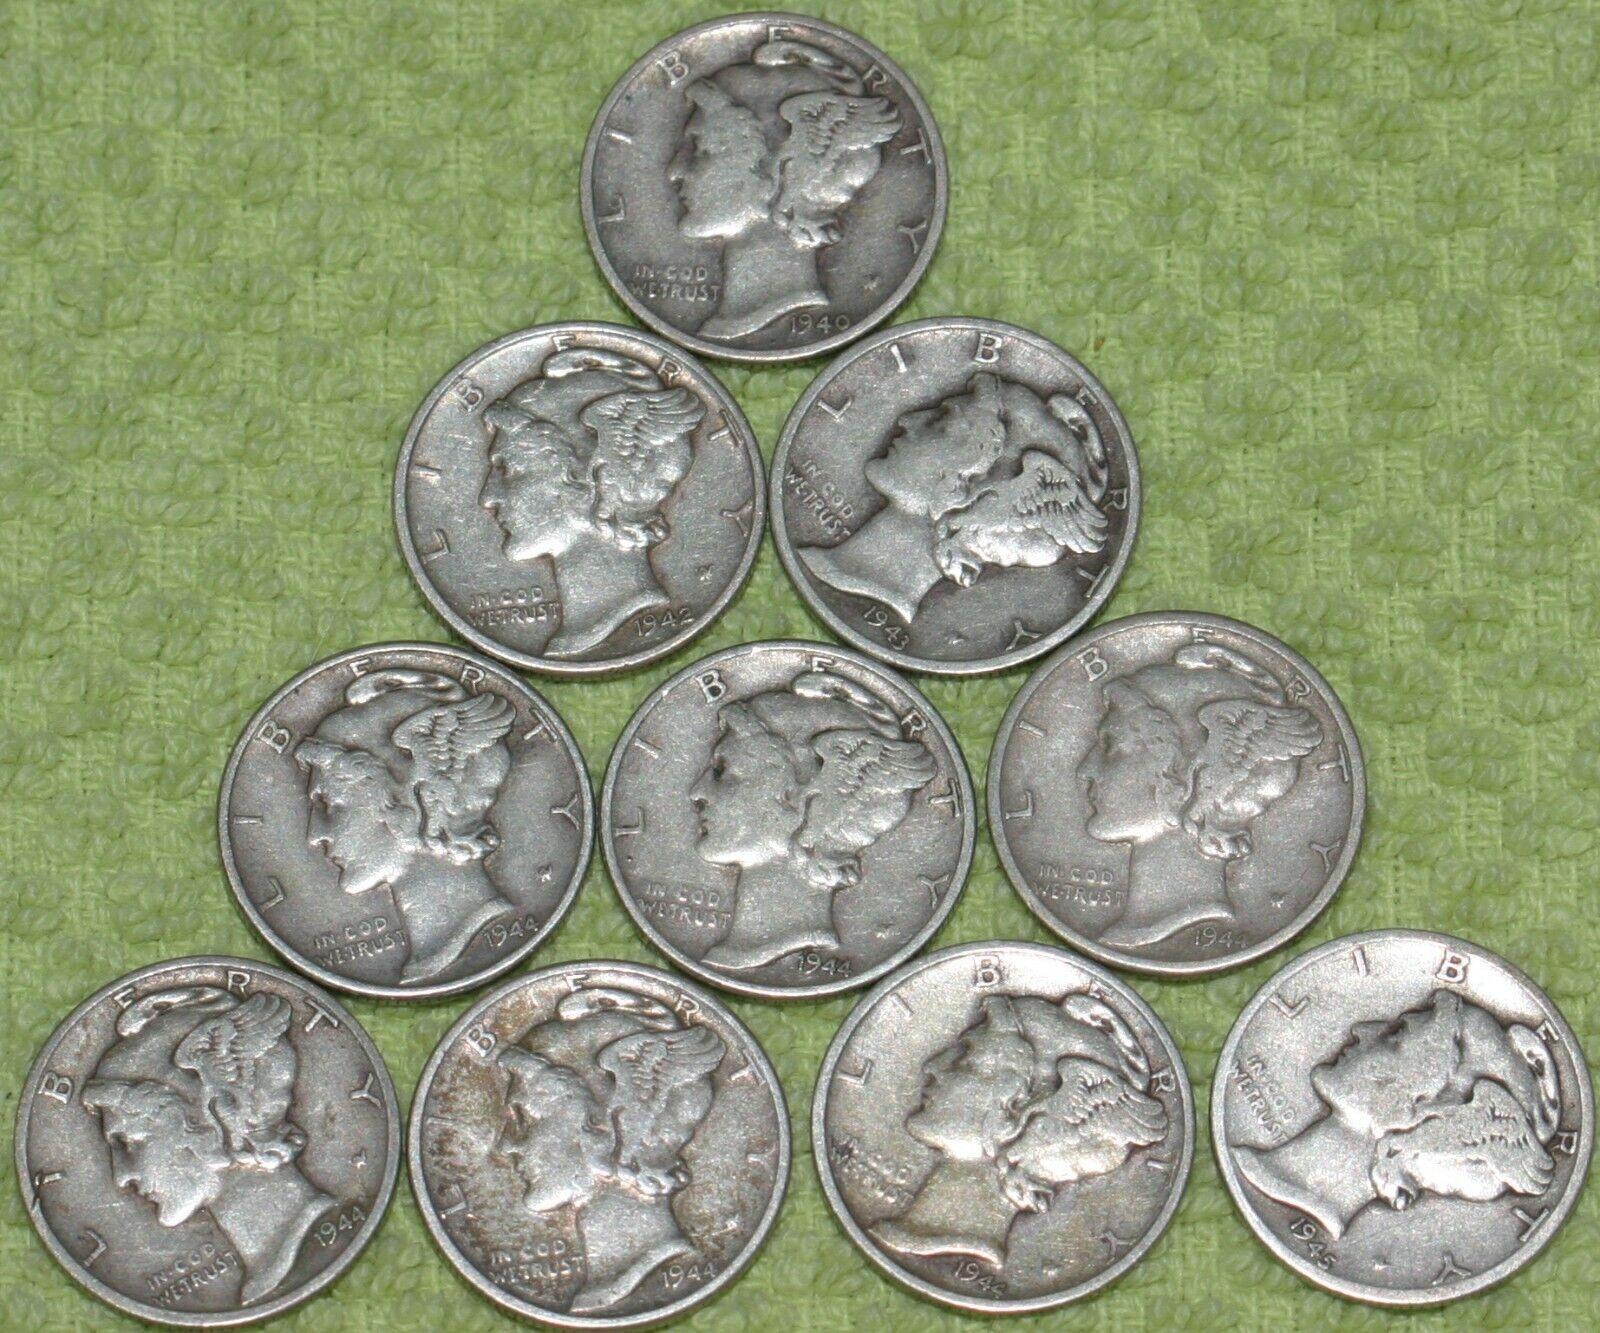 Group Of Ten Average Circulated Mercury Dimes - $19.76